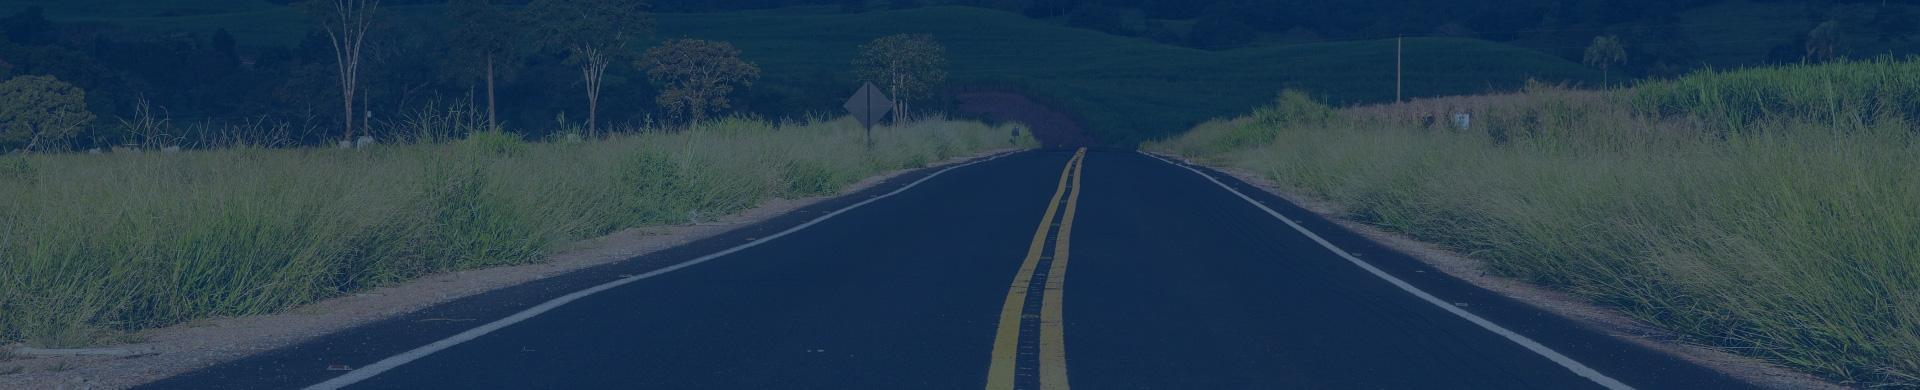 onroad drive school